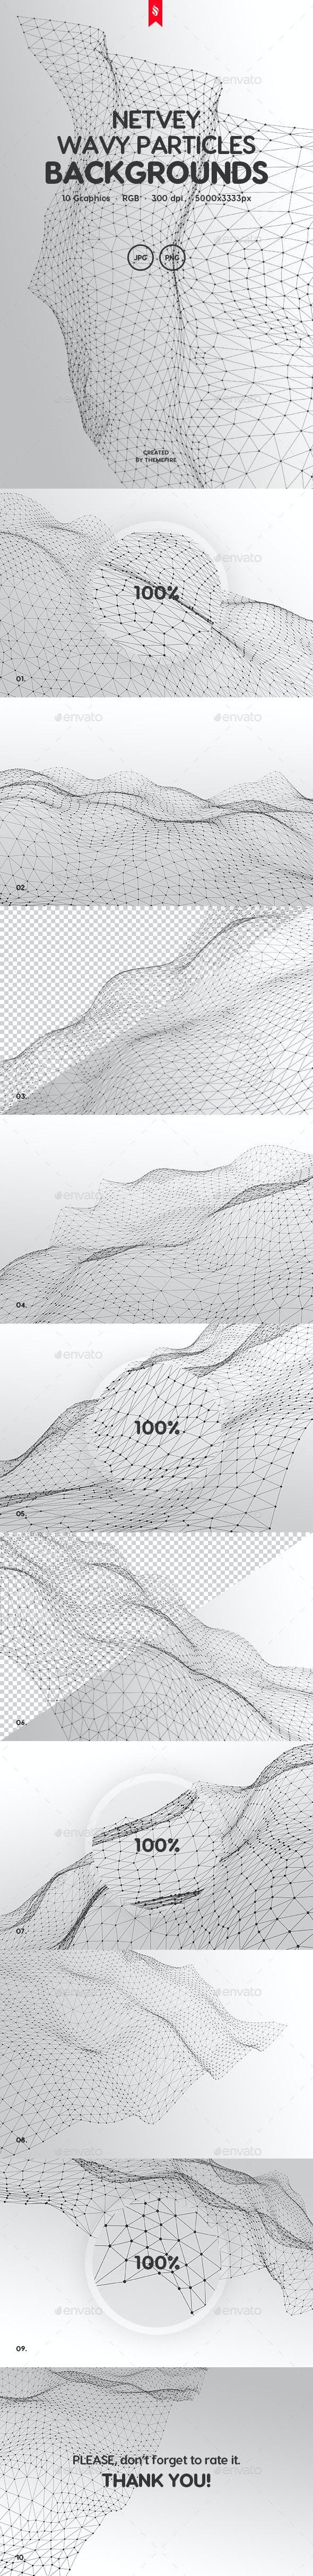 Netvey - Futuristic Wavy Particles Backgrounds - Tech / Futuristic Backgrounds